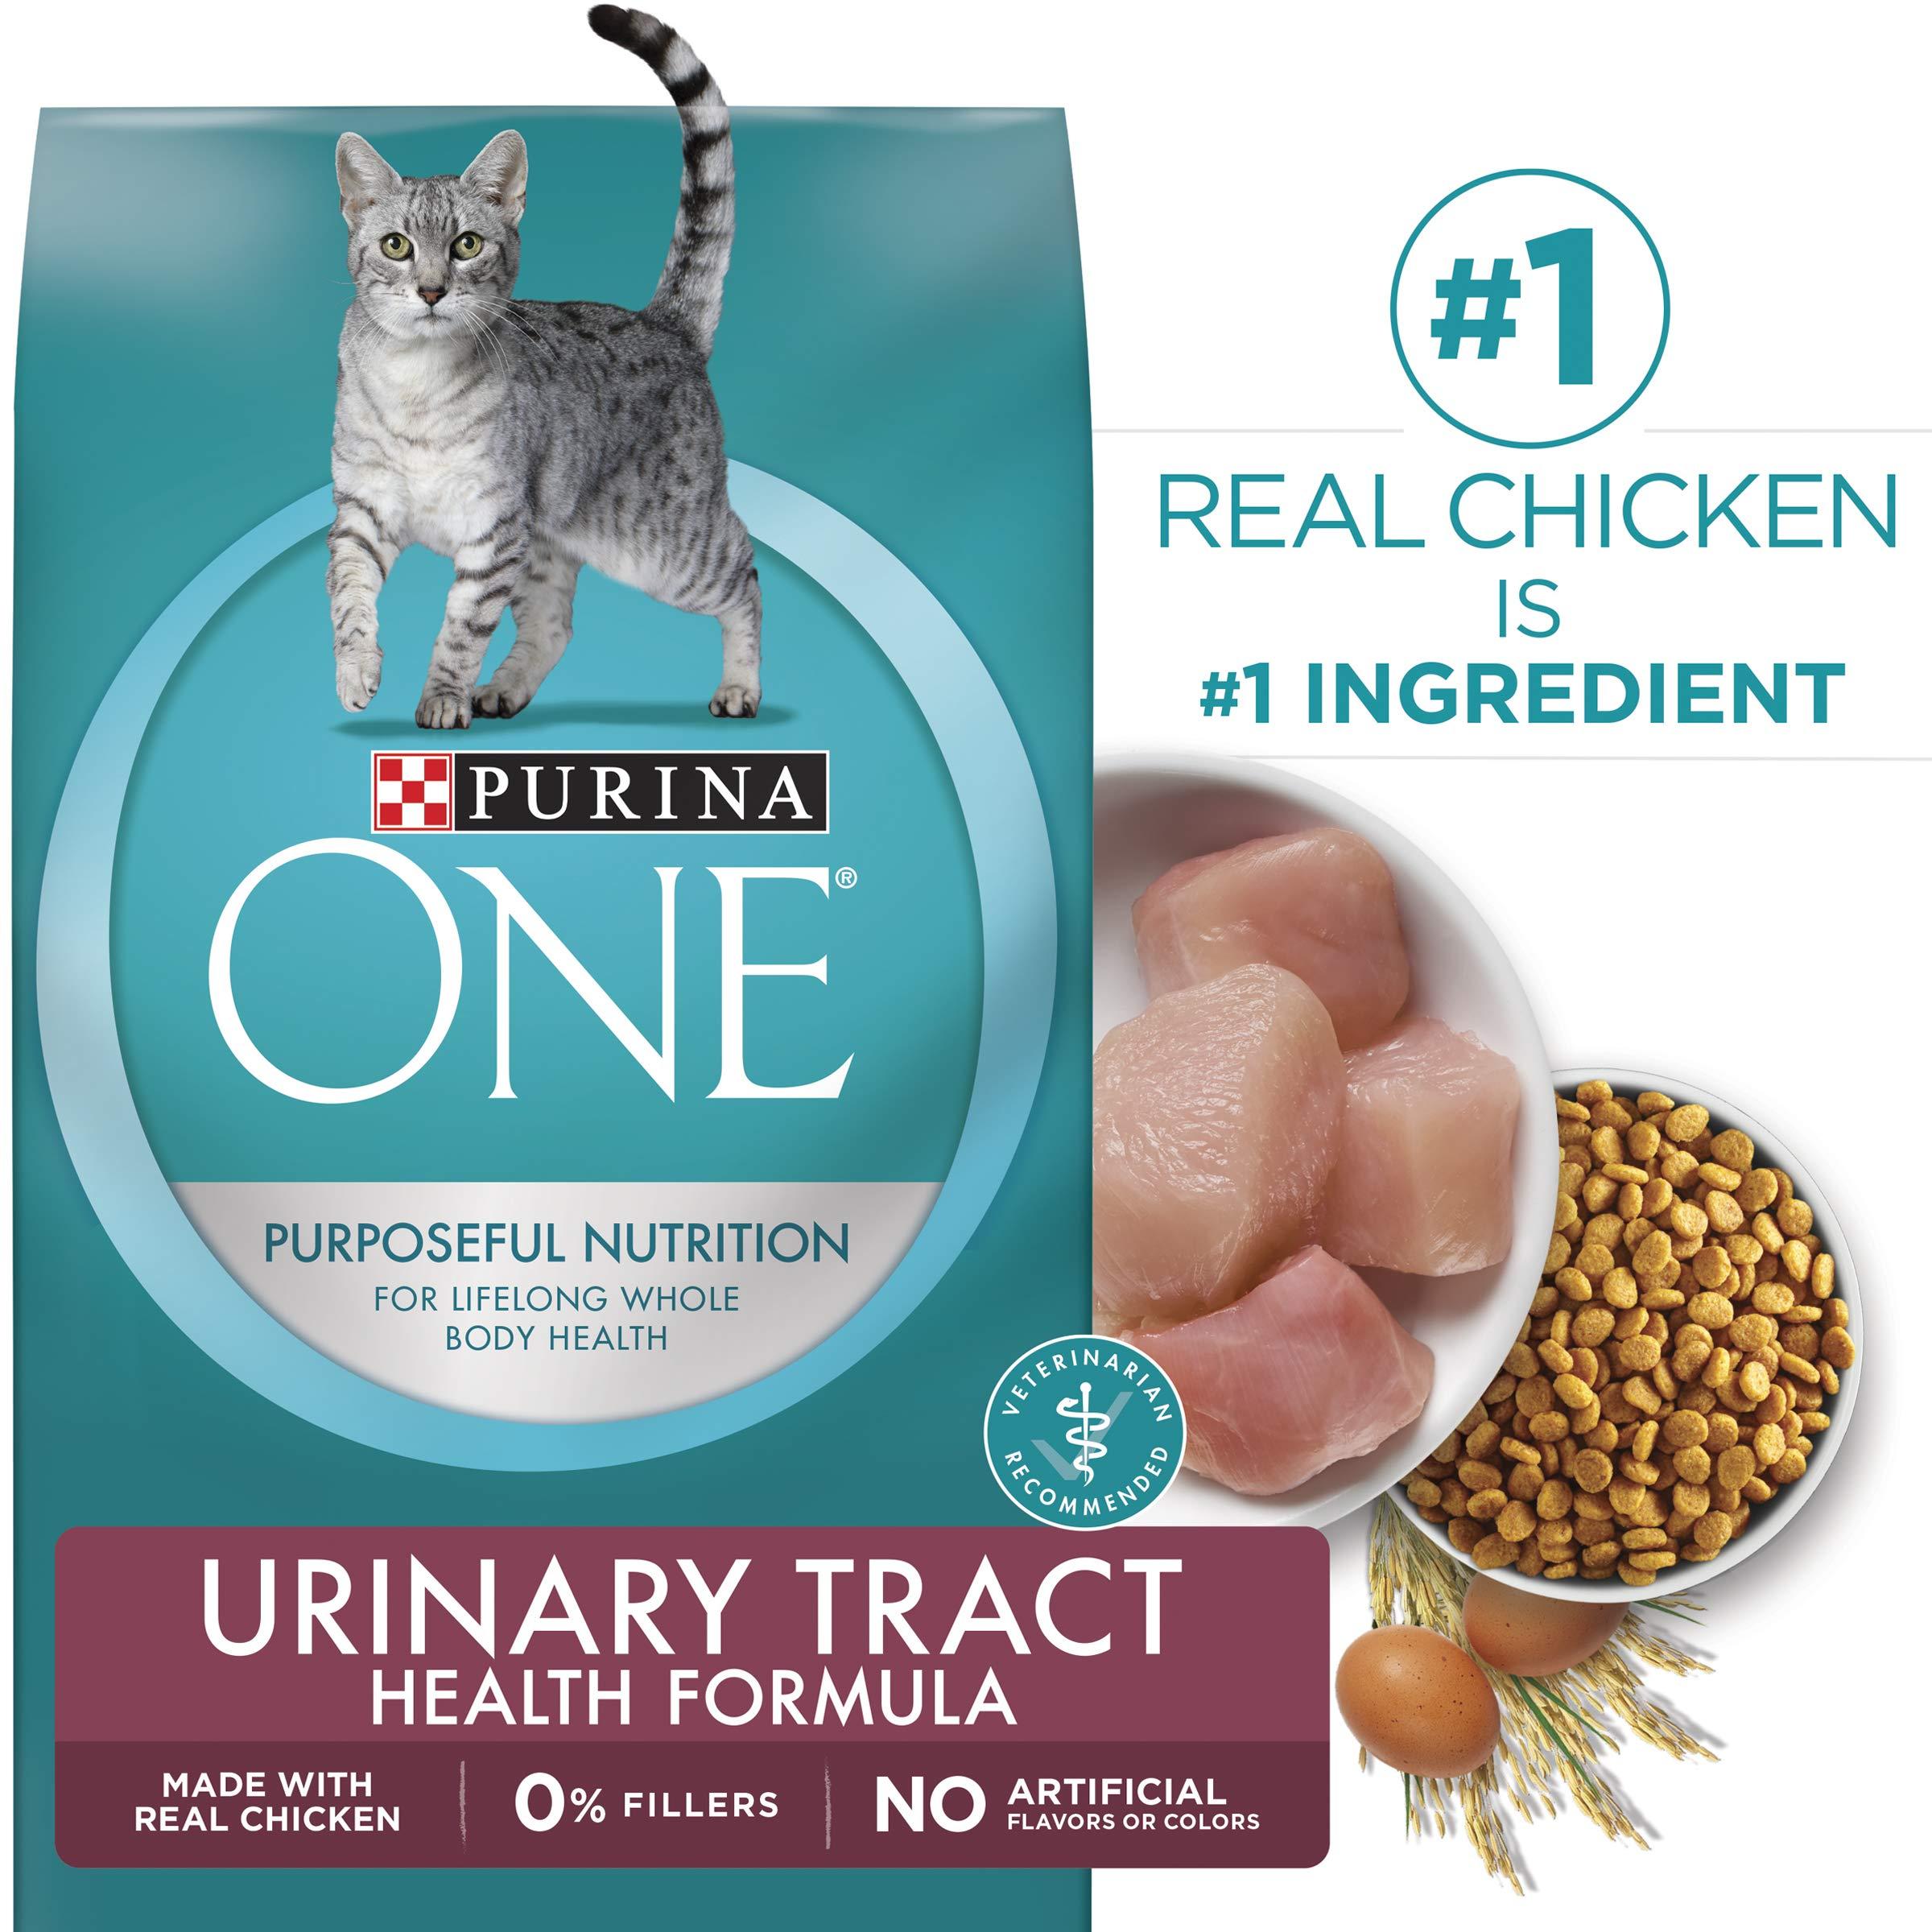 Purina ONE Urinary Tract Health Dry Cat Food; Urinary Tract Health Formula - 7 lb. Bag by Purina ONE (Image #1)